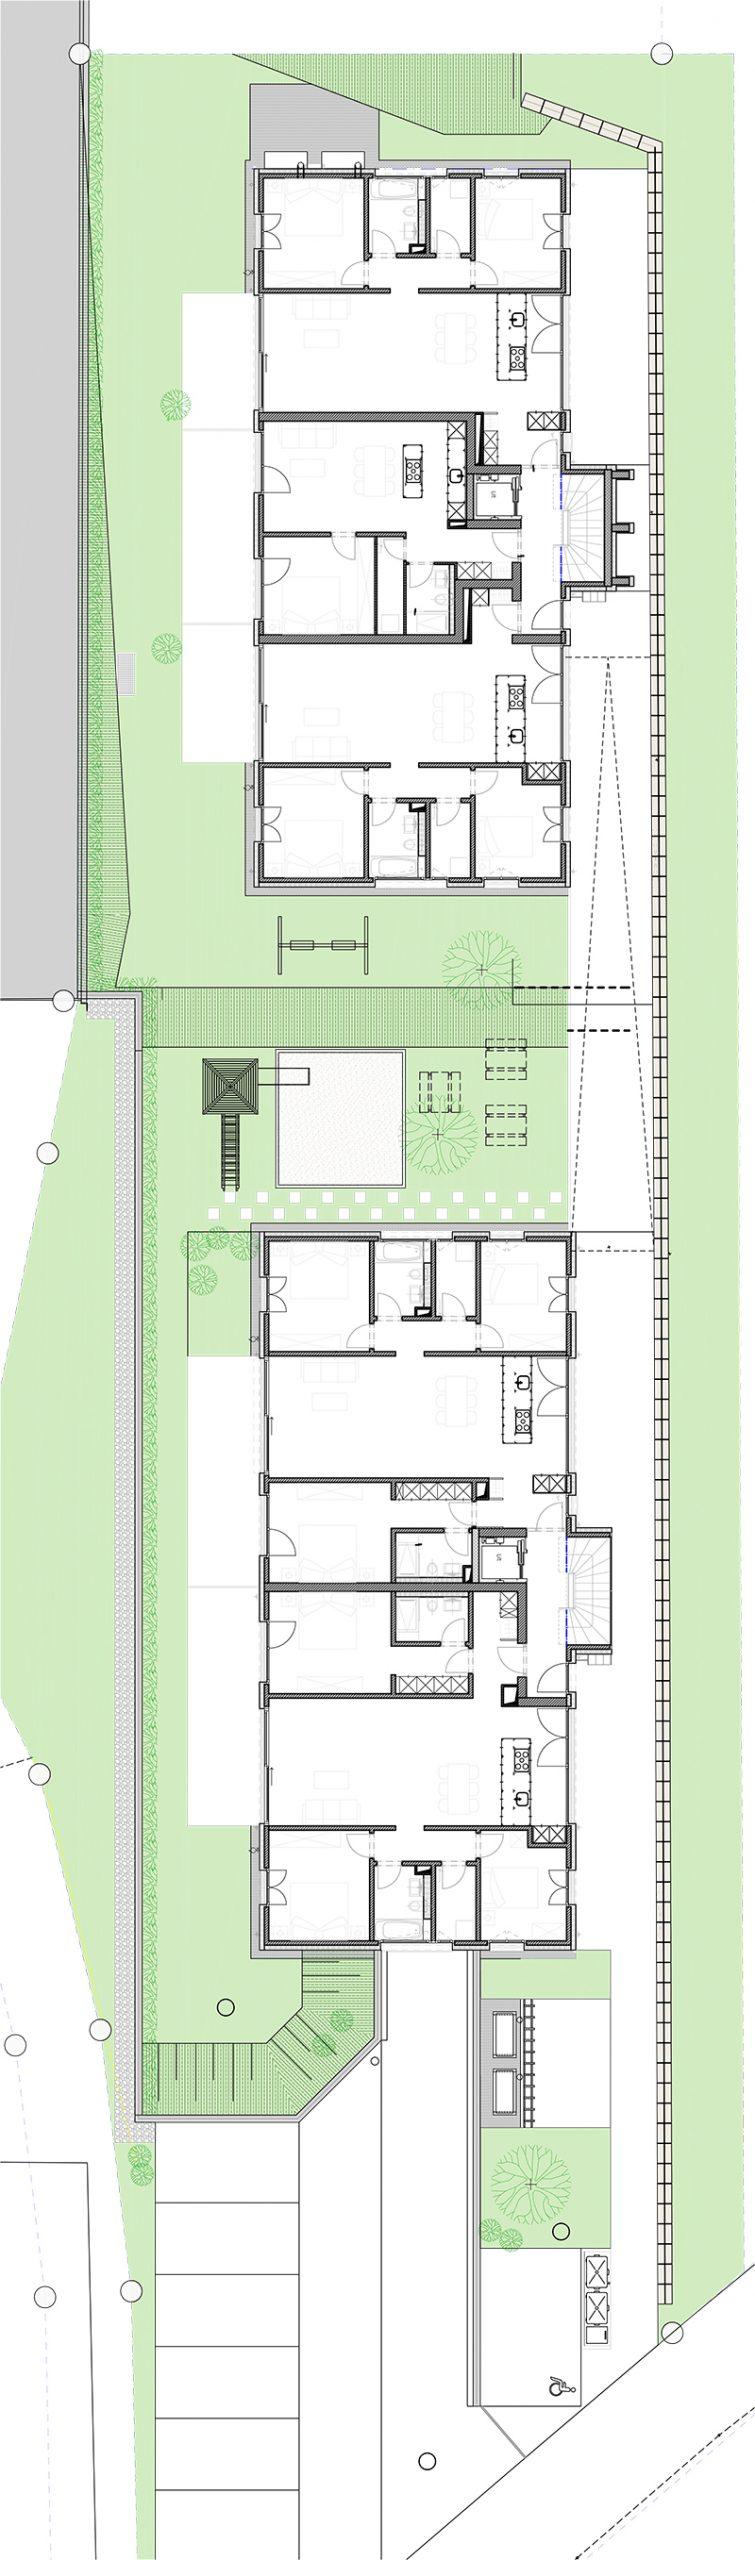 MFH-Boezen-Werkplan-Umgebungsplan-2